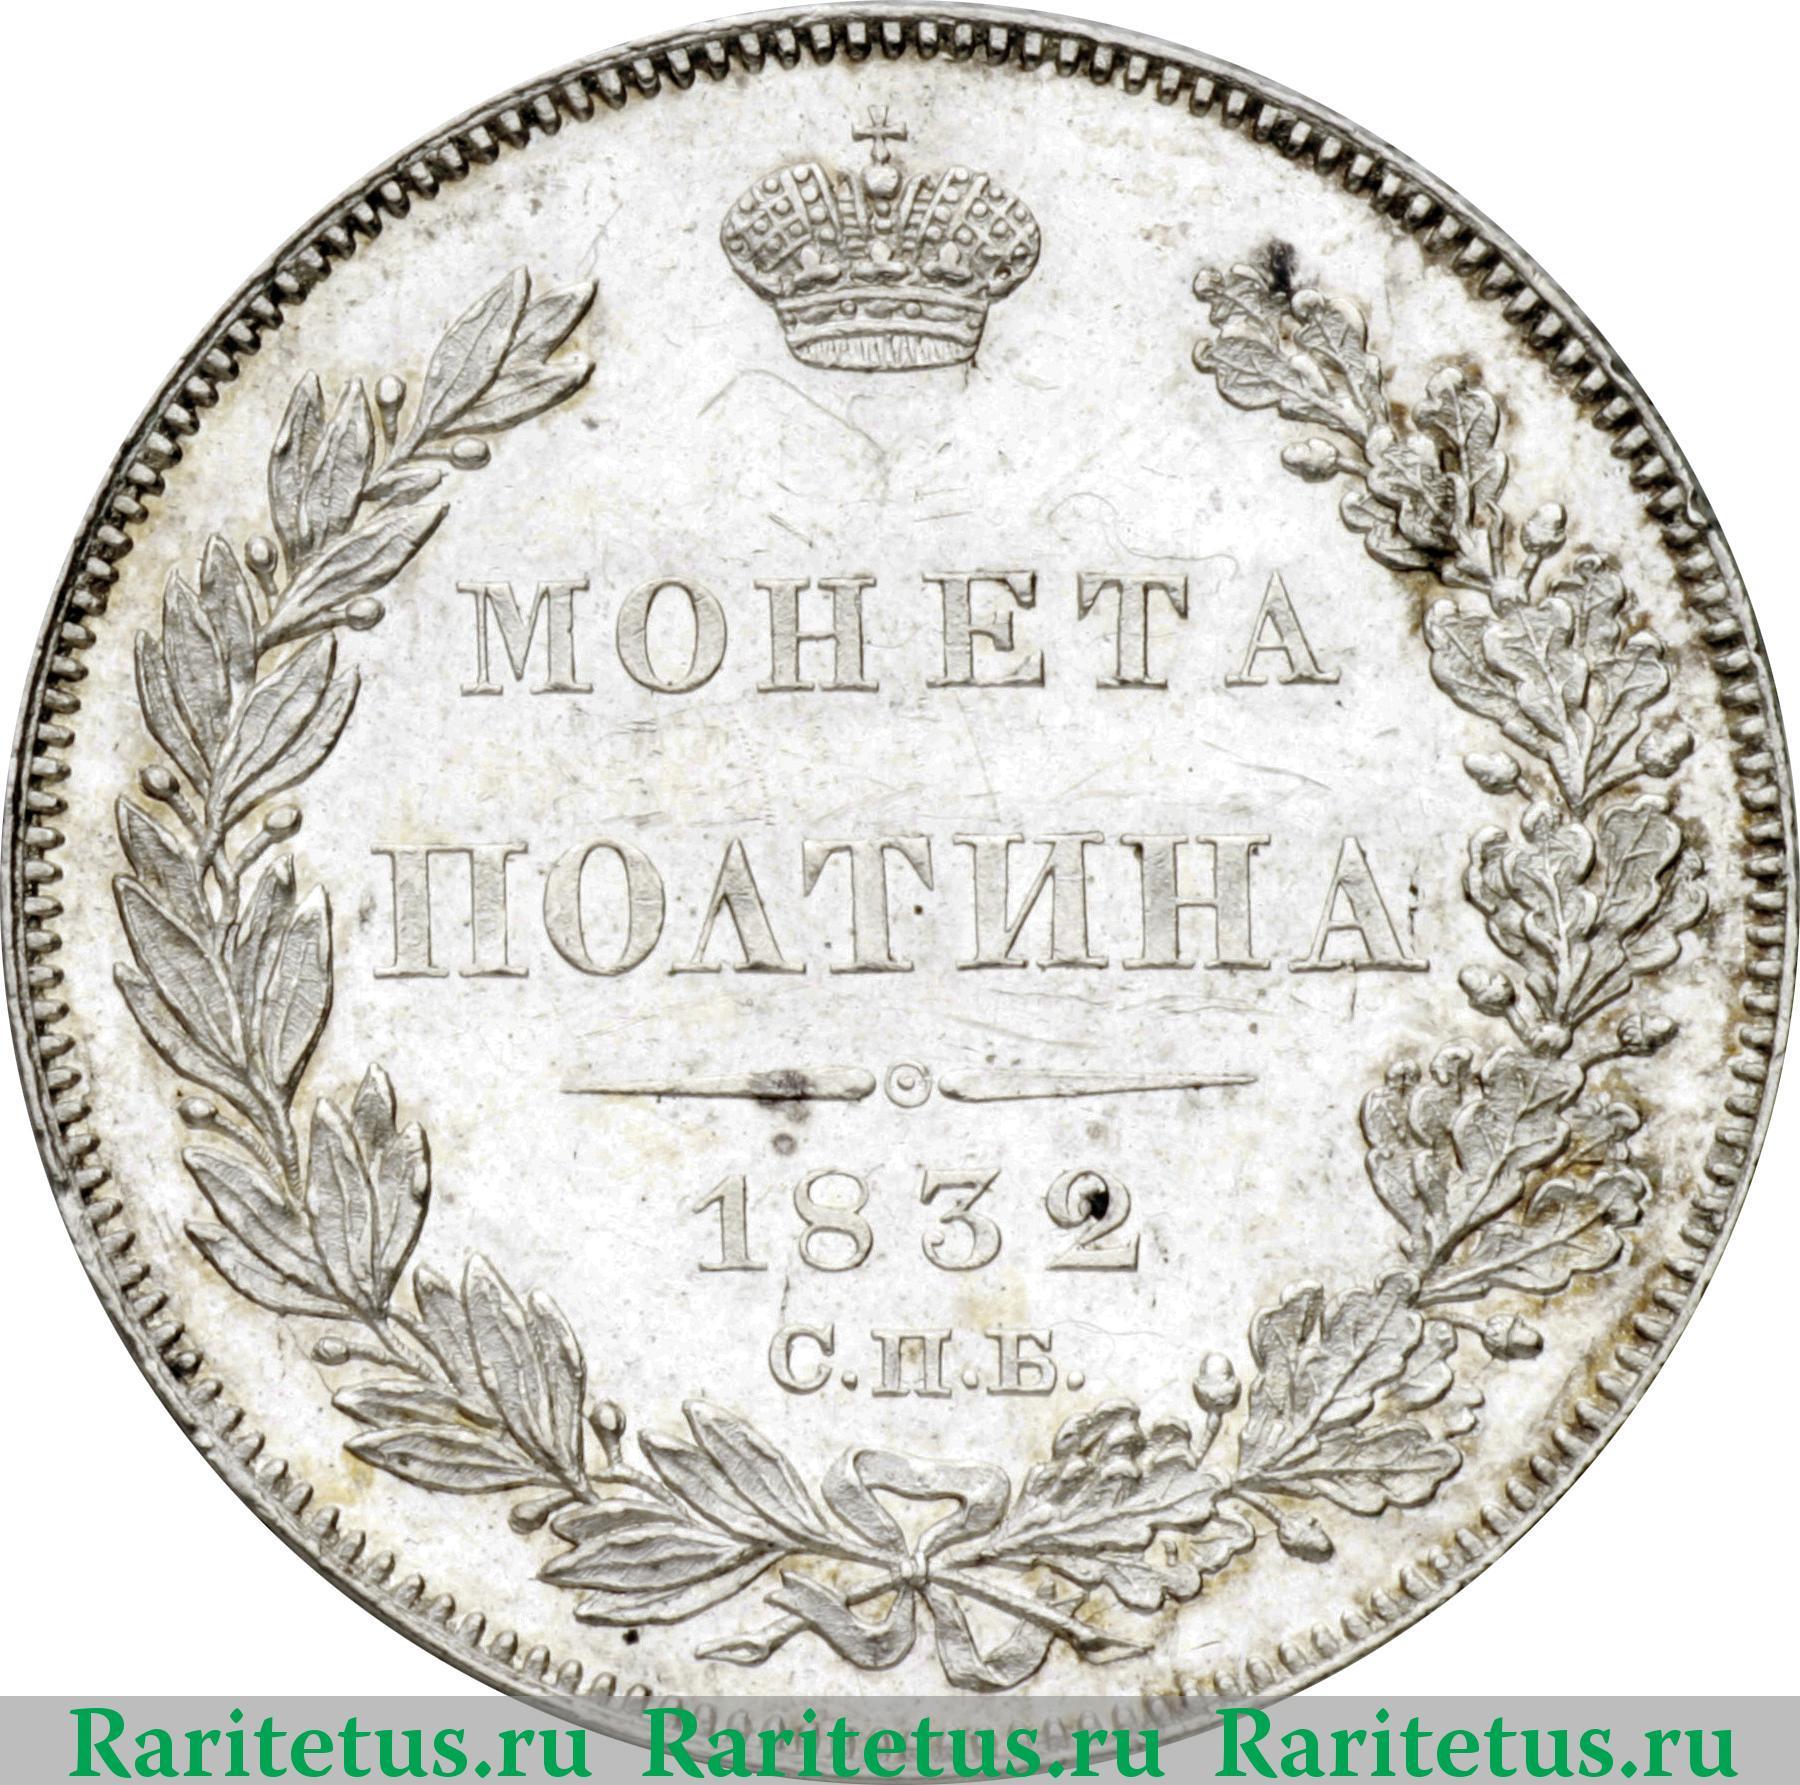 Серебряная монета 1832 года цена 33 карата